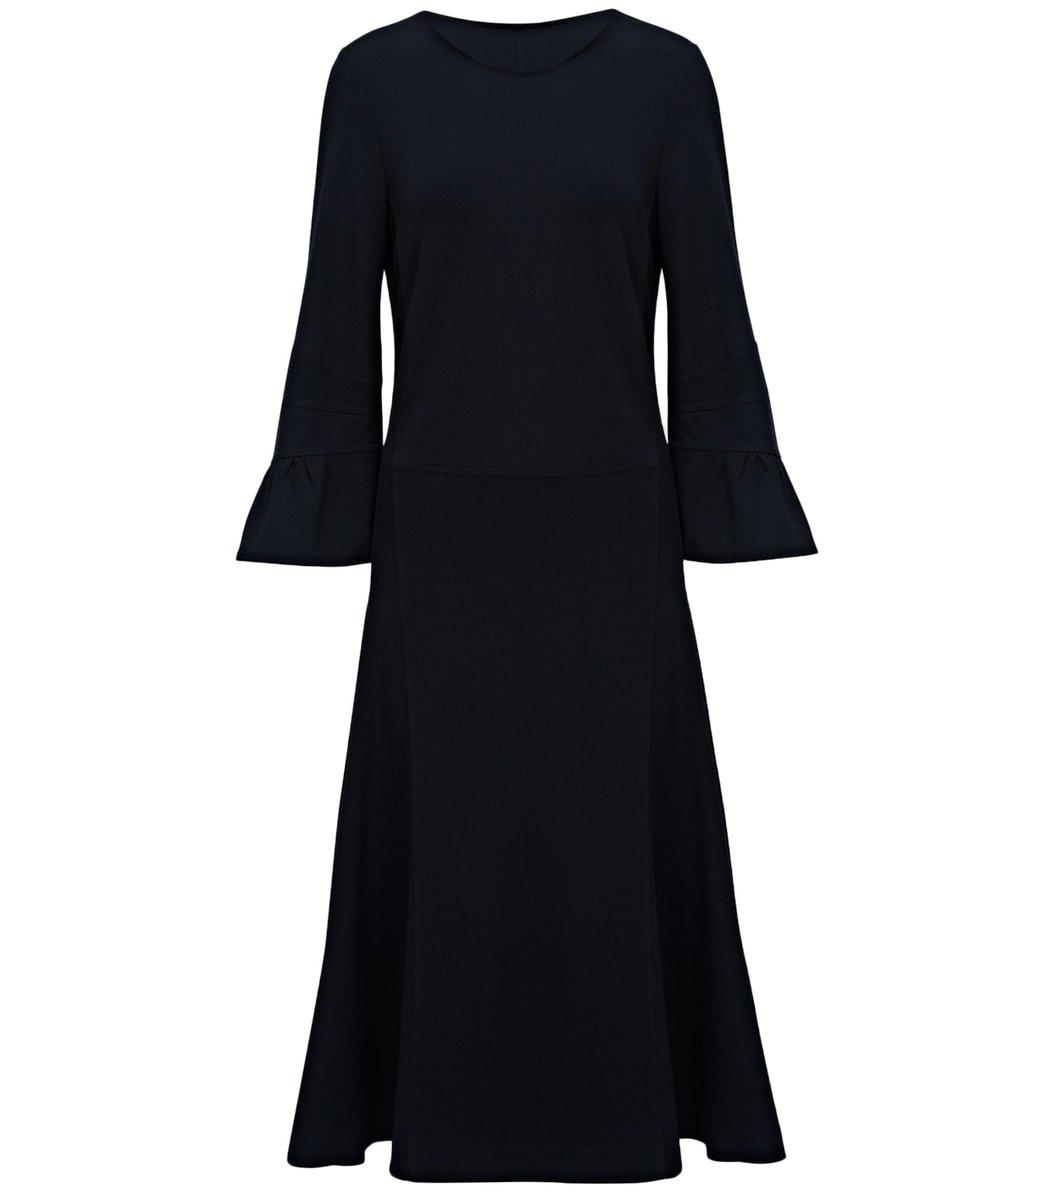 Dorothee Schumacher Dresses City Allure Dress in Pure Black